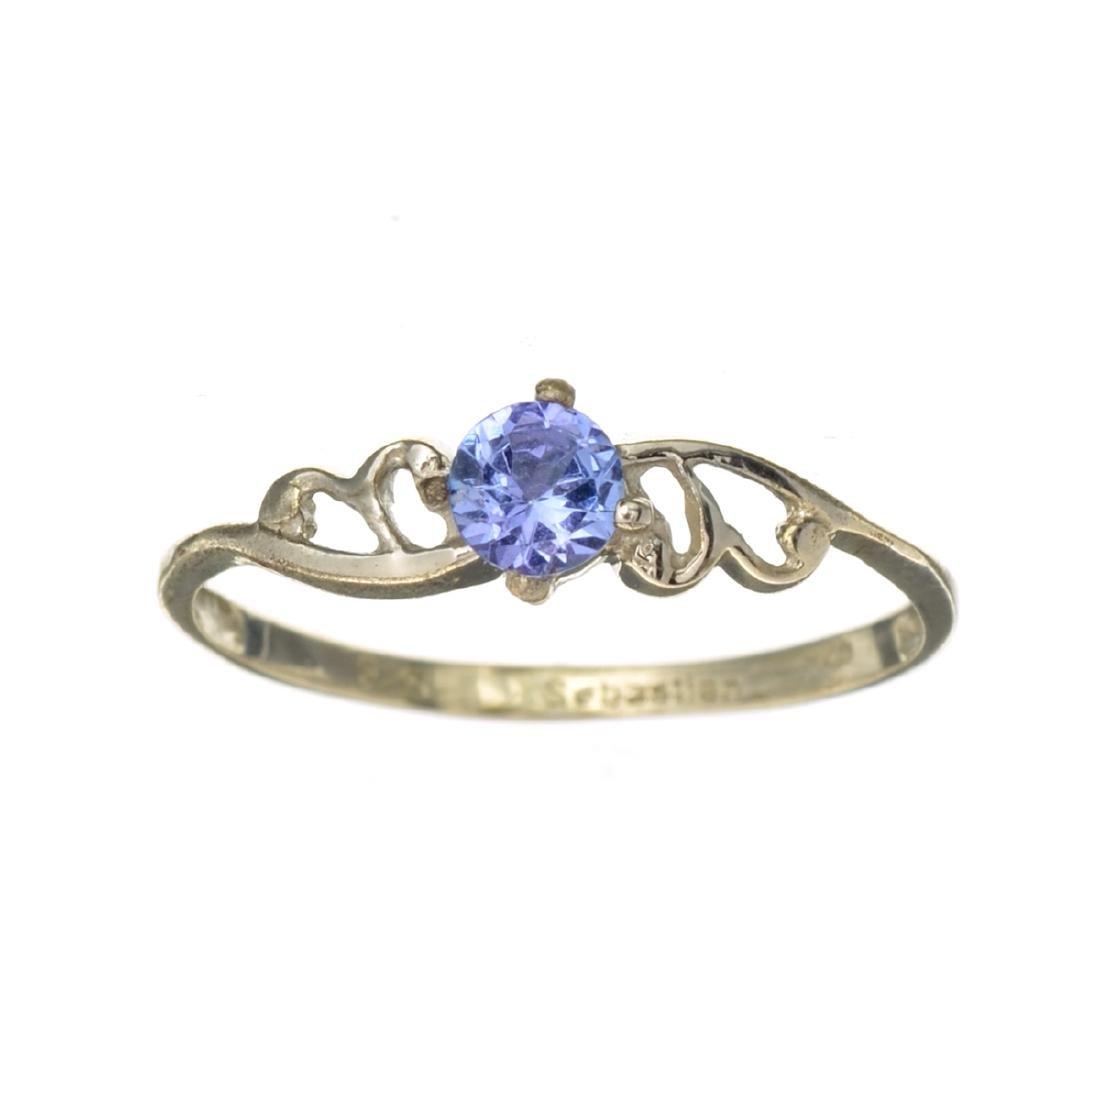 APP: 0.6k Fine Jewelry 0.30CT Round Cut Tanzanite And